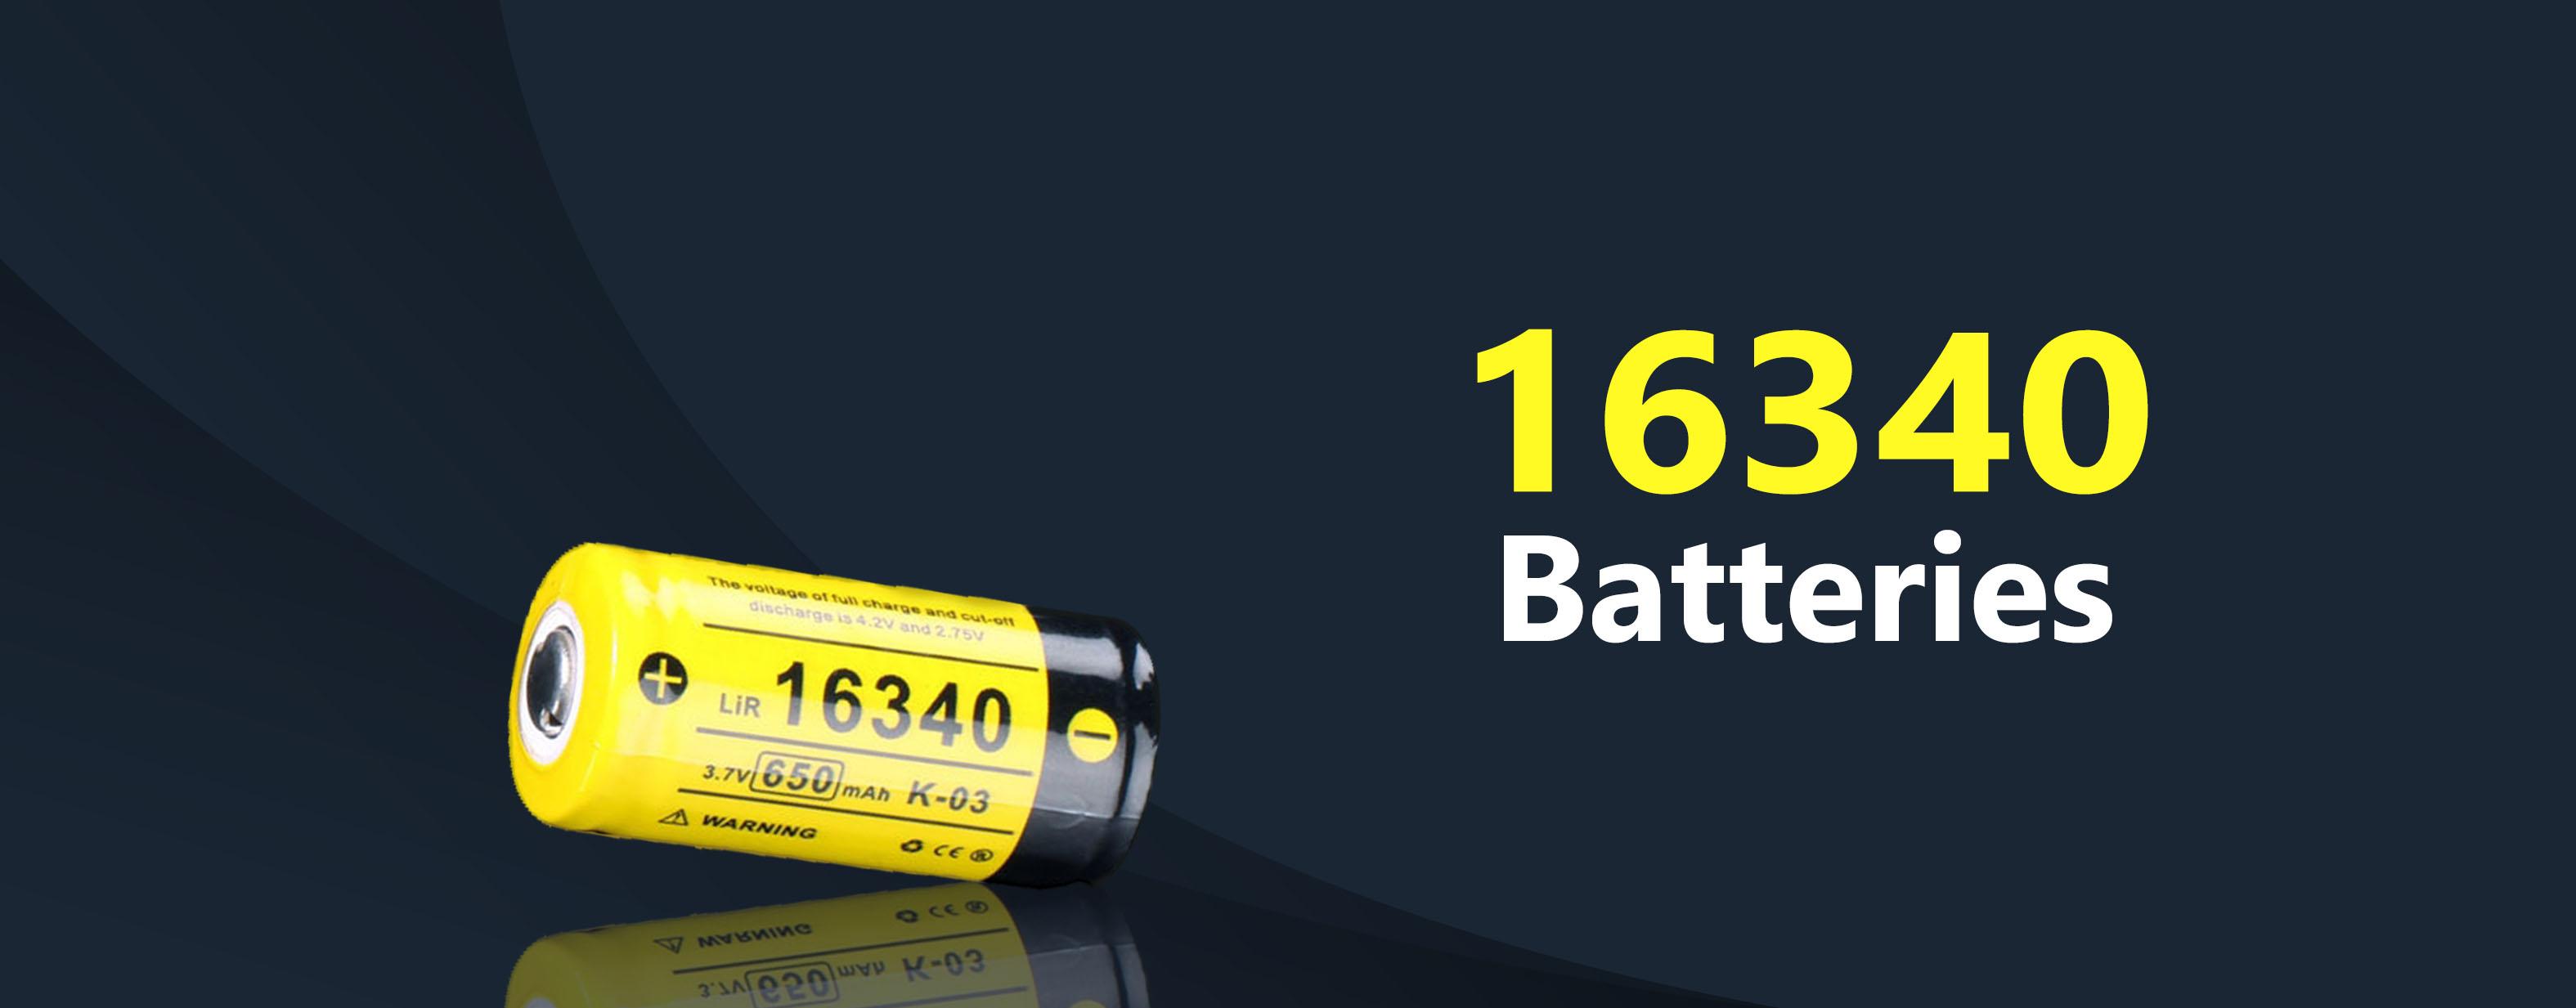 16340 Batteries